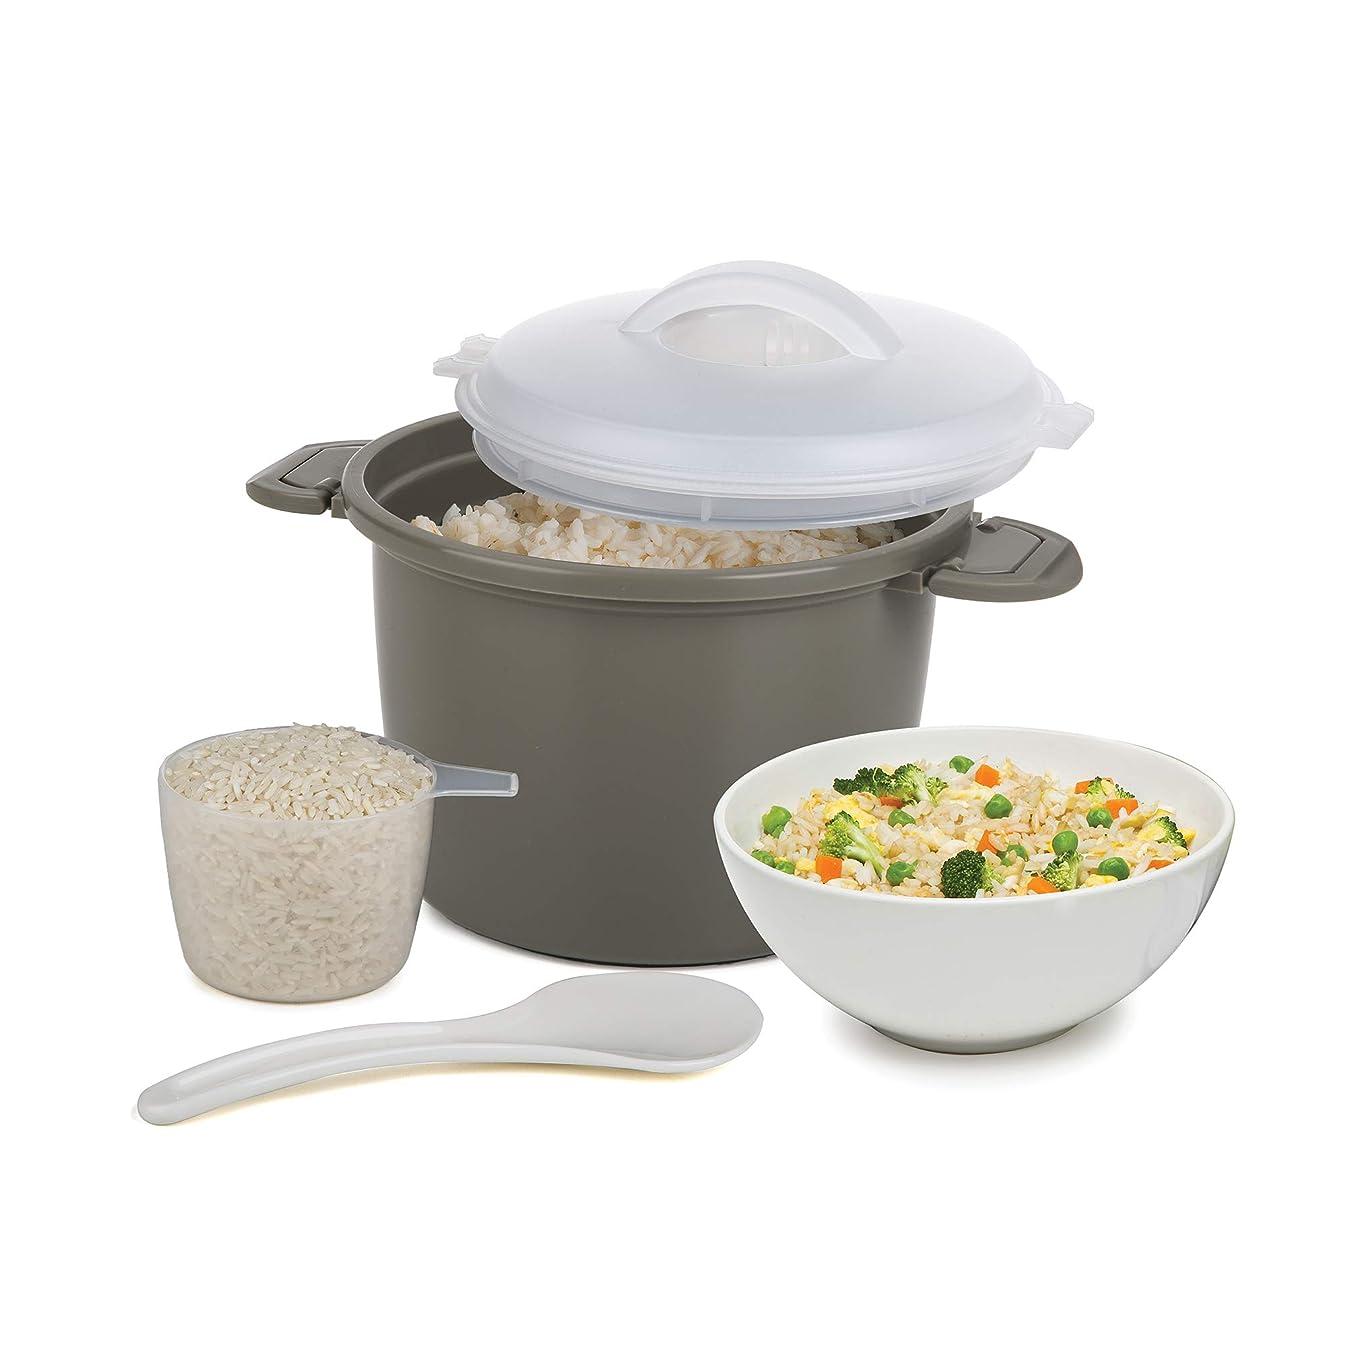 Progressive International PS-96GY Set Microwave Rice Cooker, 4 Piece, Gray